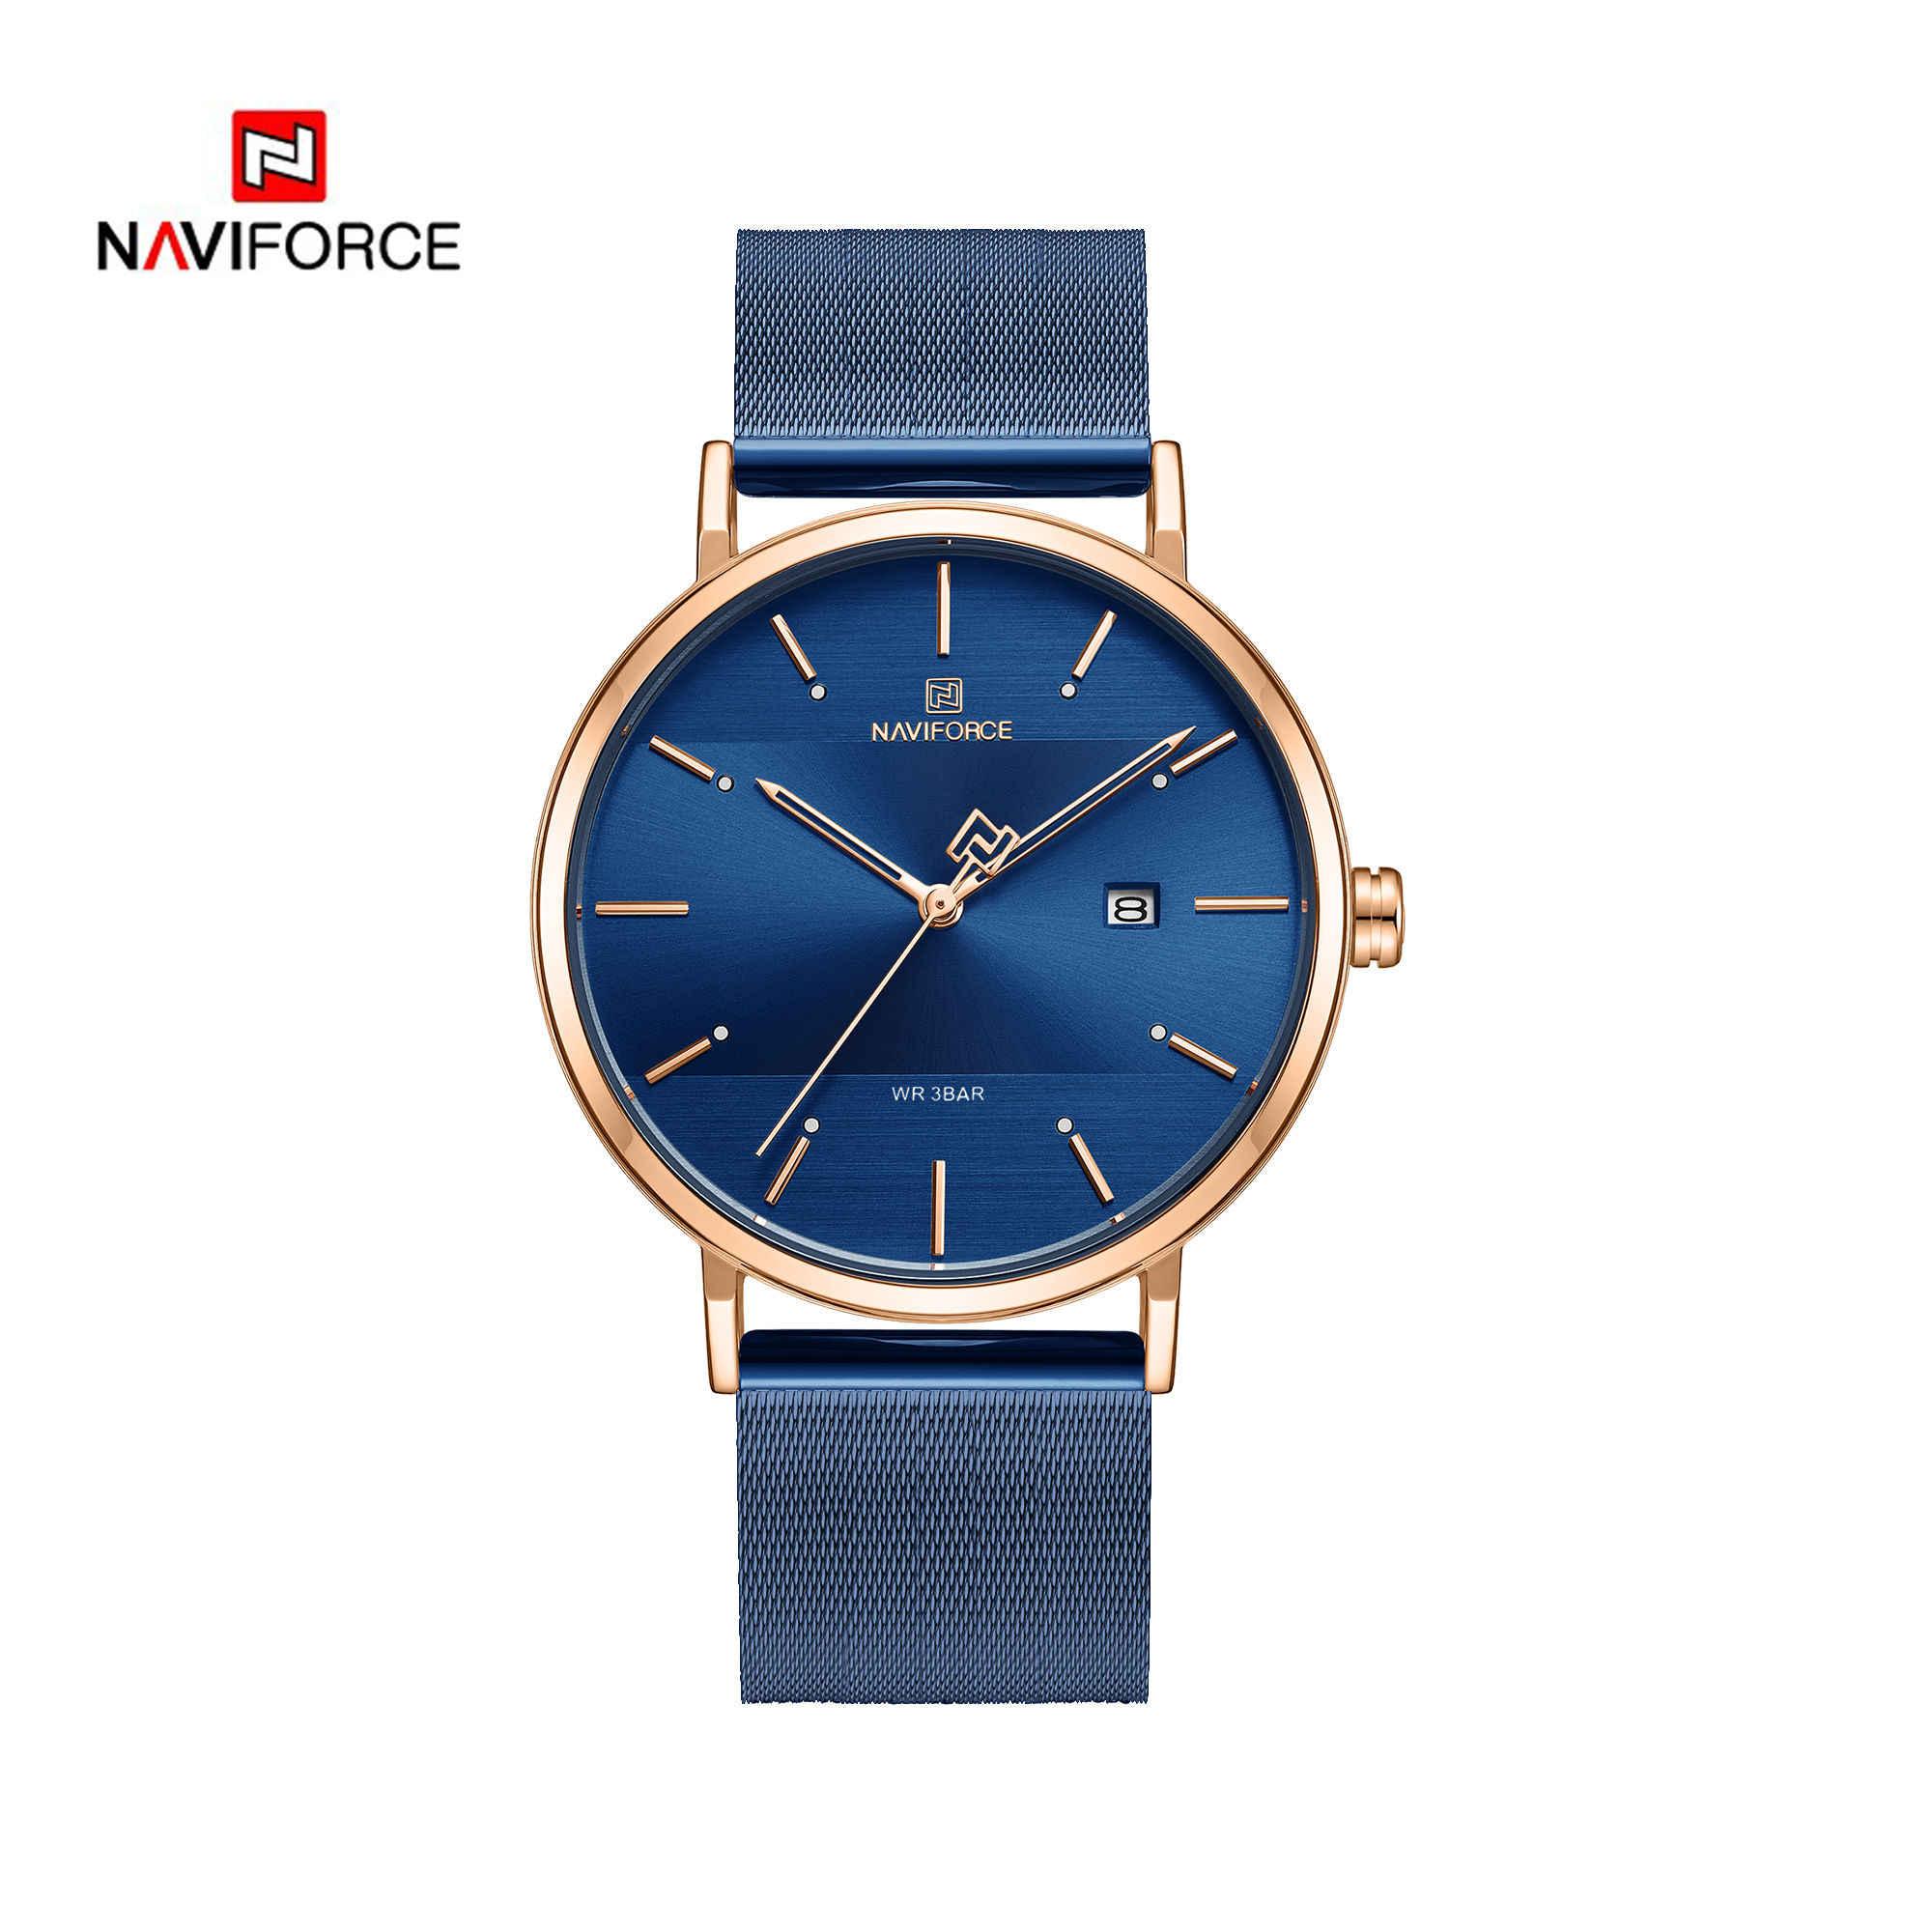 NAVIFORCE אופנה שעון זוג רשת פלדת חגורת נשים שעונים למעלה מותג יוקרה עמיד למים נשים שעונים Reloj Mujer